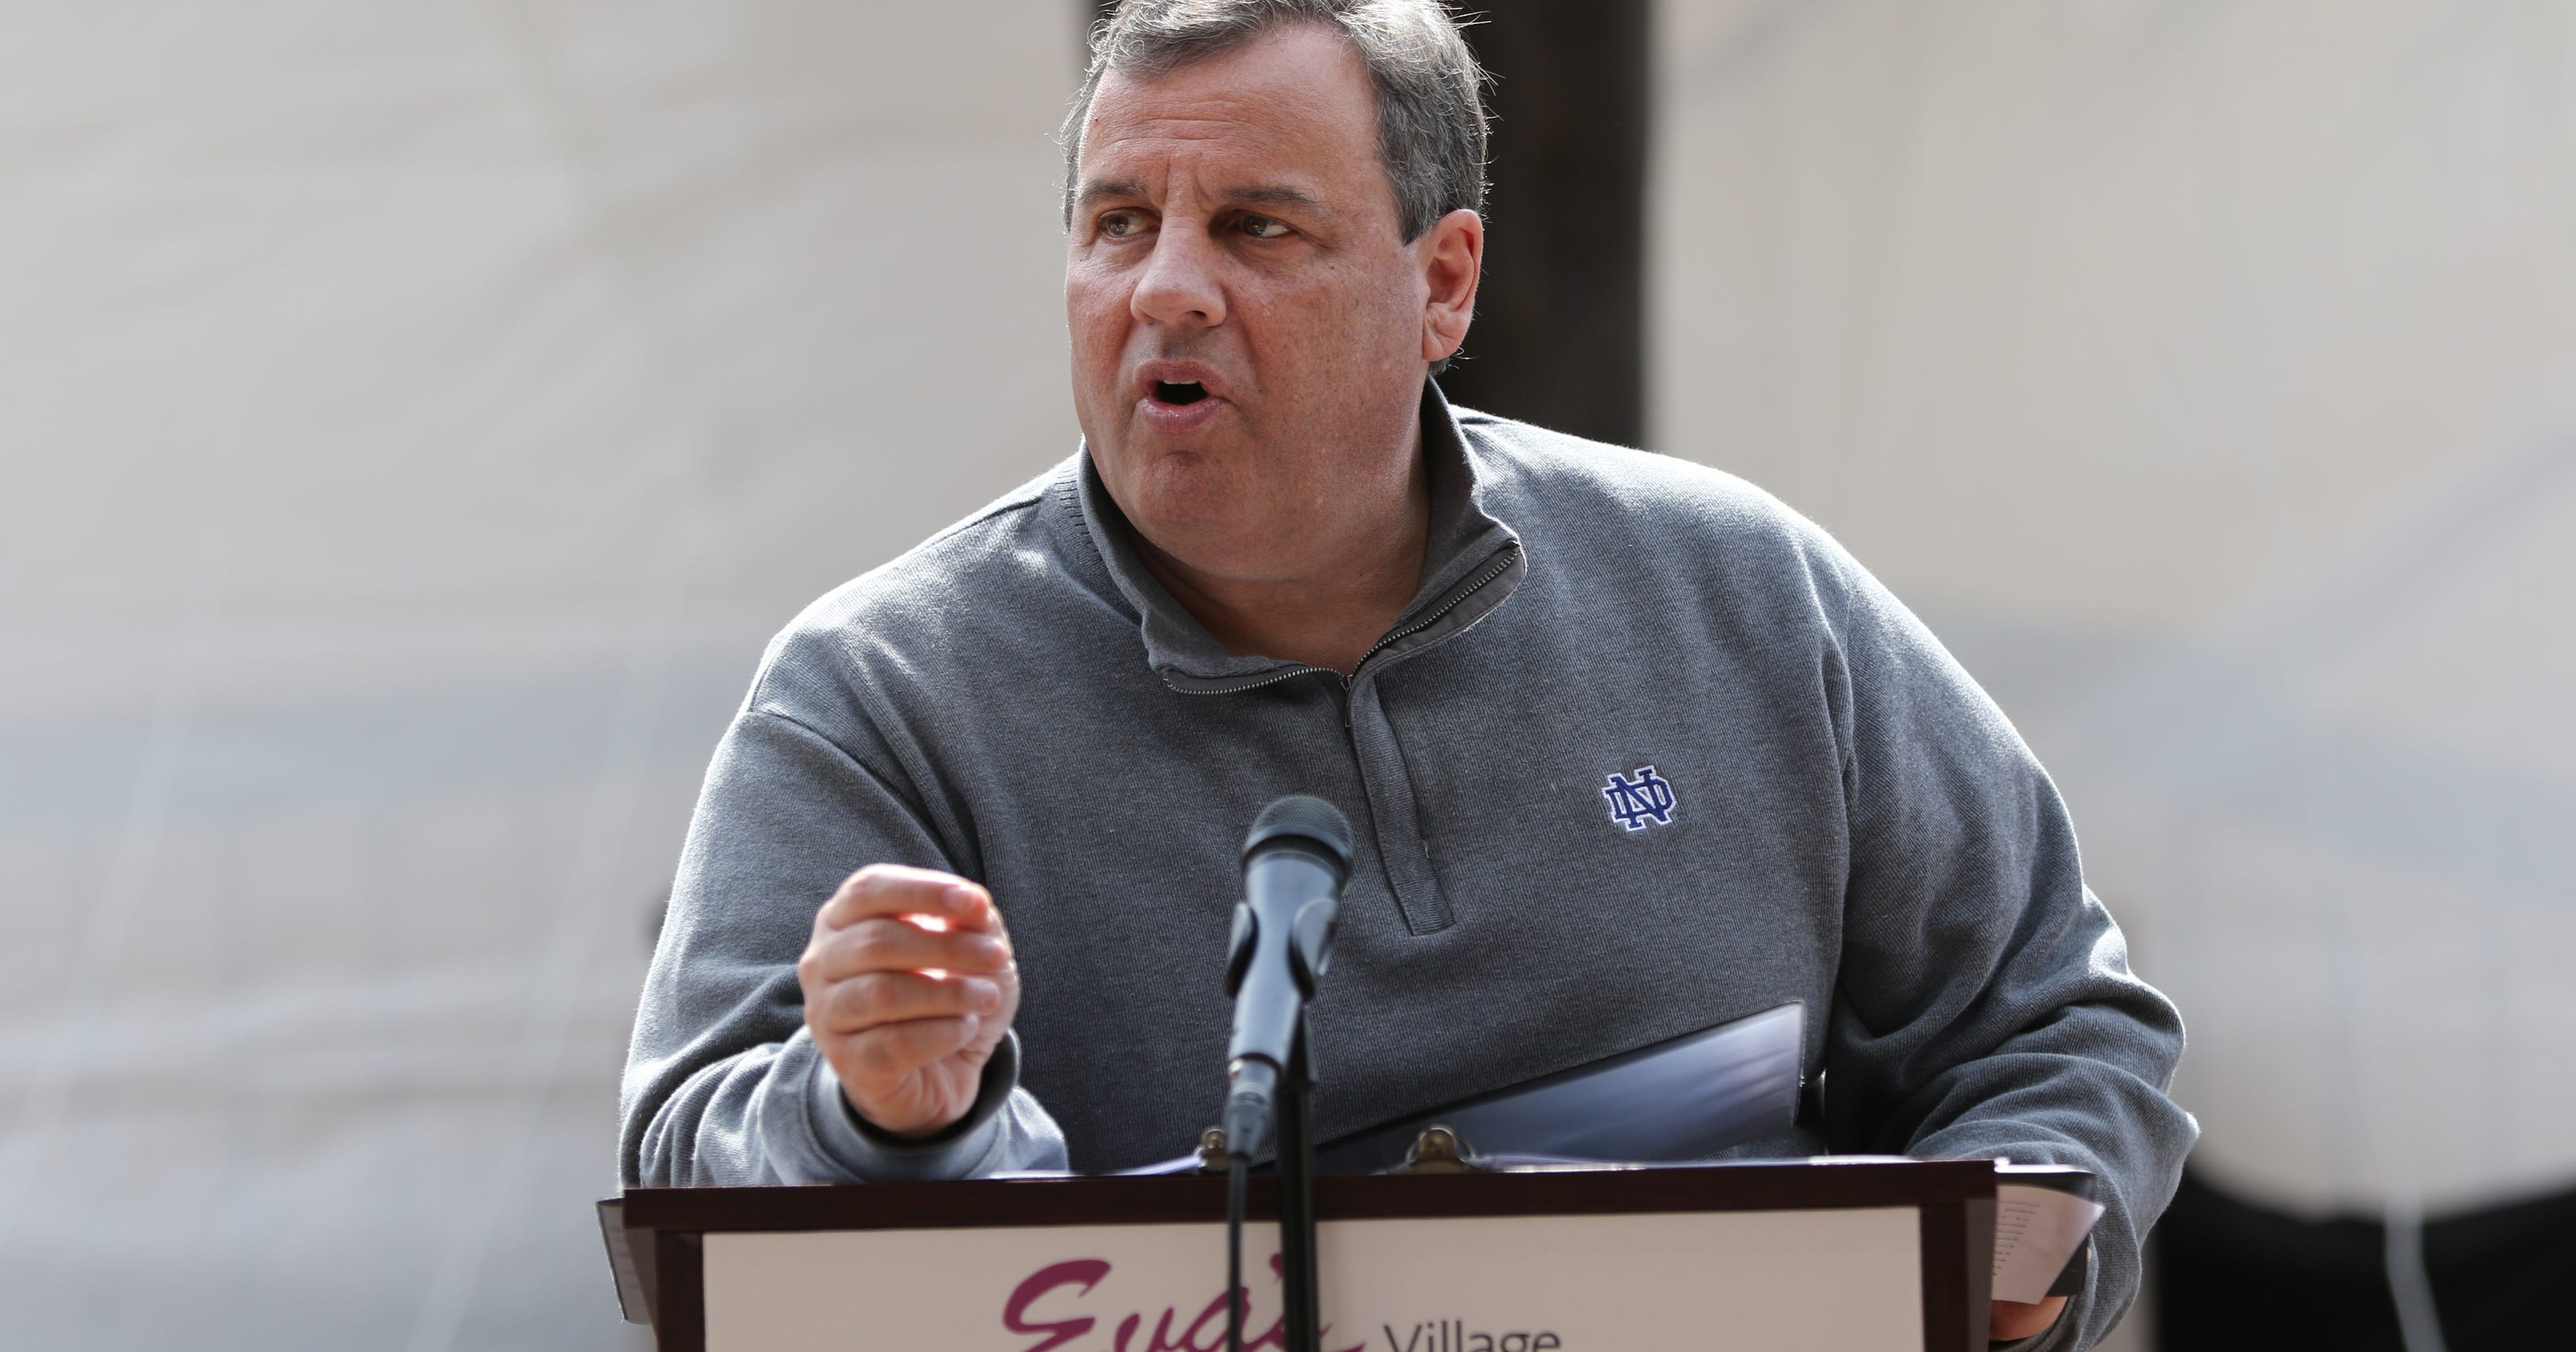 Wall Street wary of Christie's health insurer plan